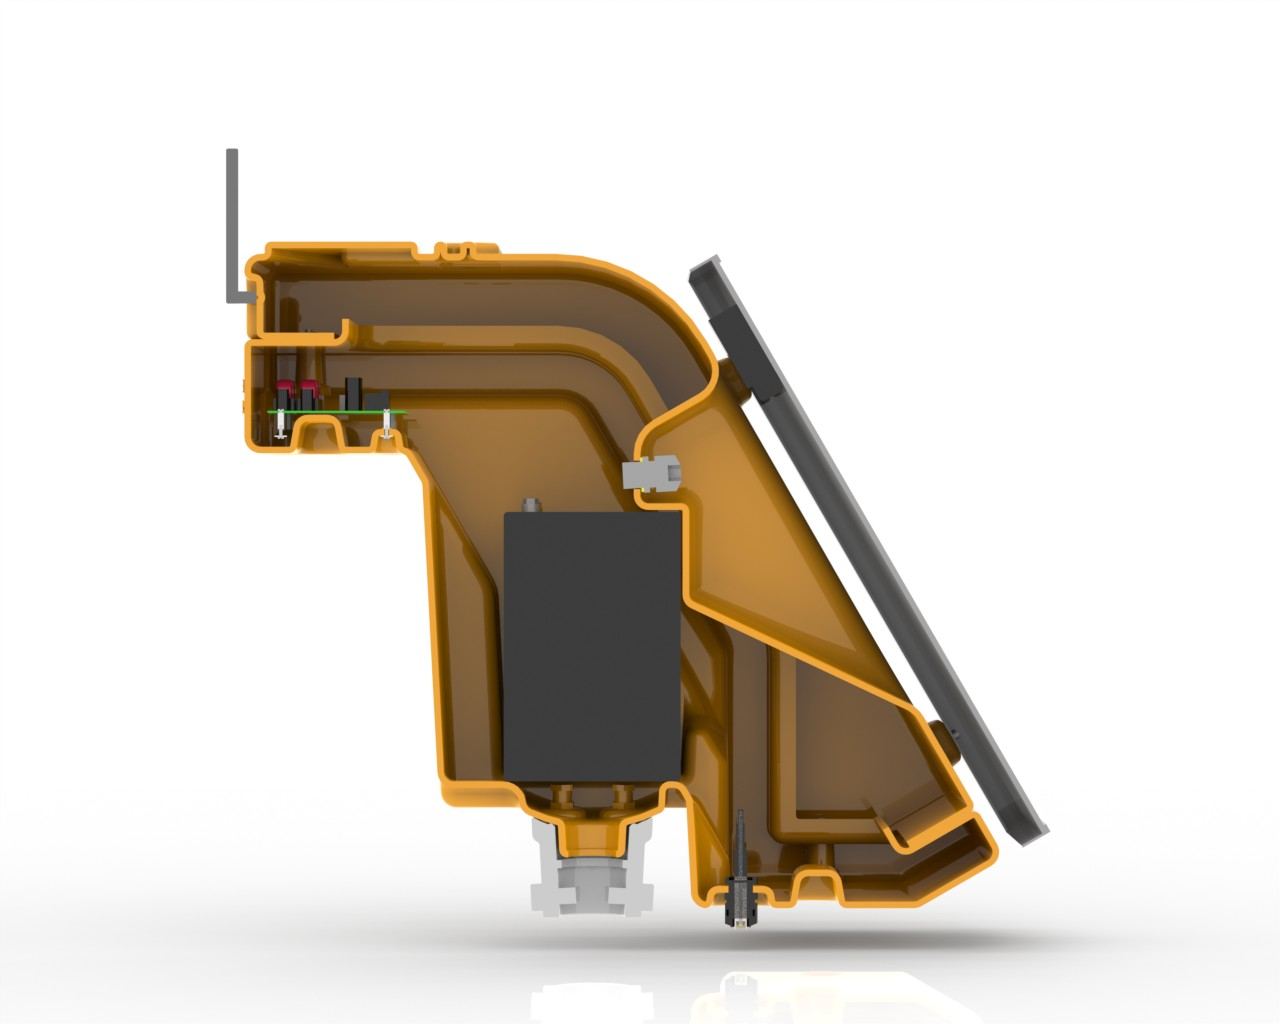 New Flashing Beacons from North America Traffic Win Innovation Award